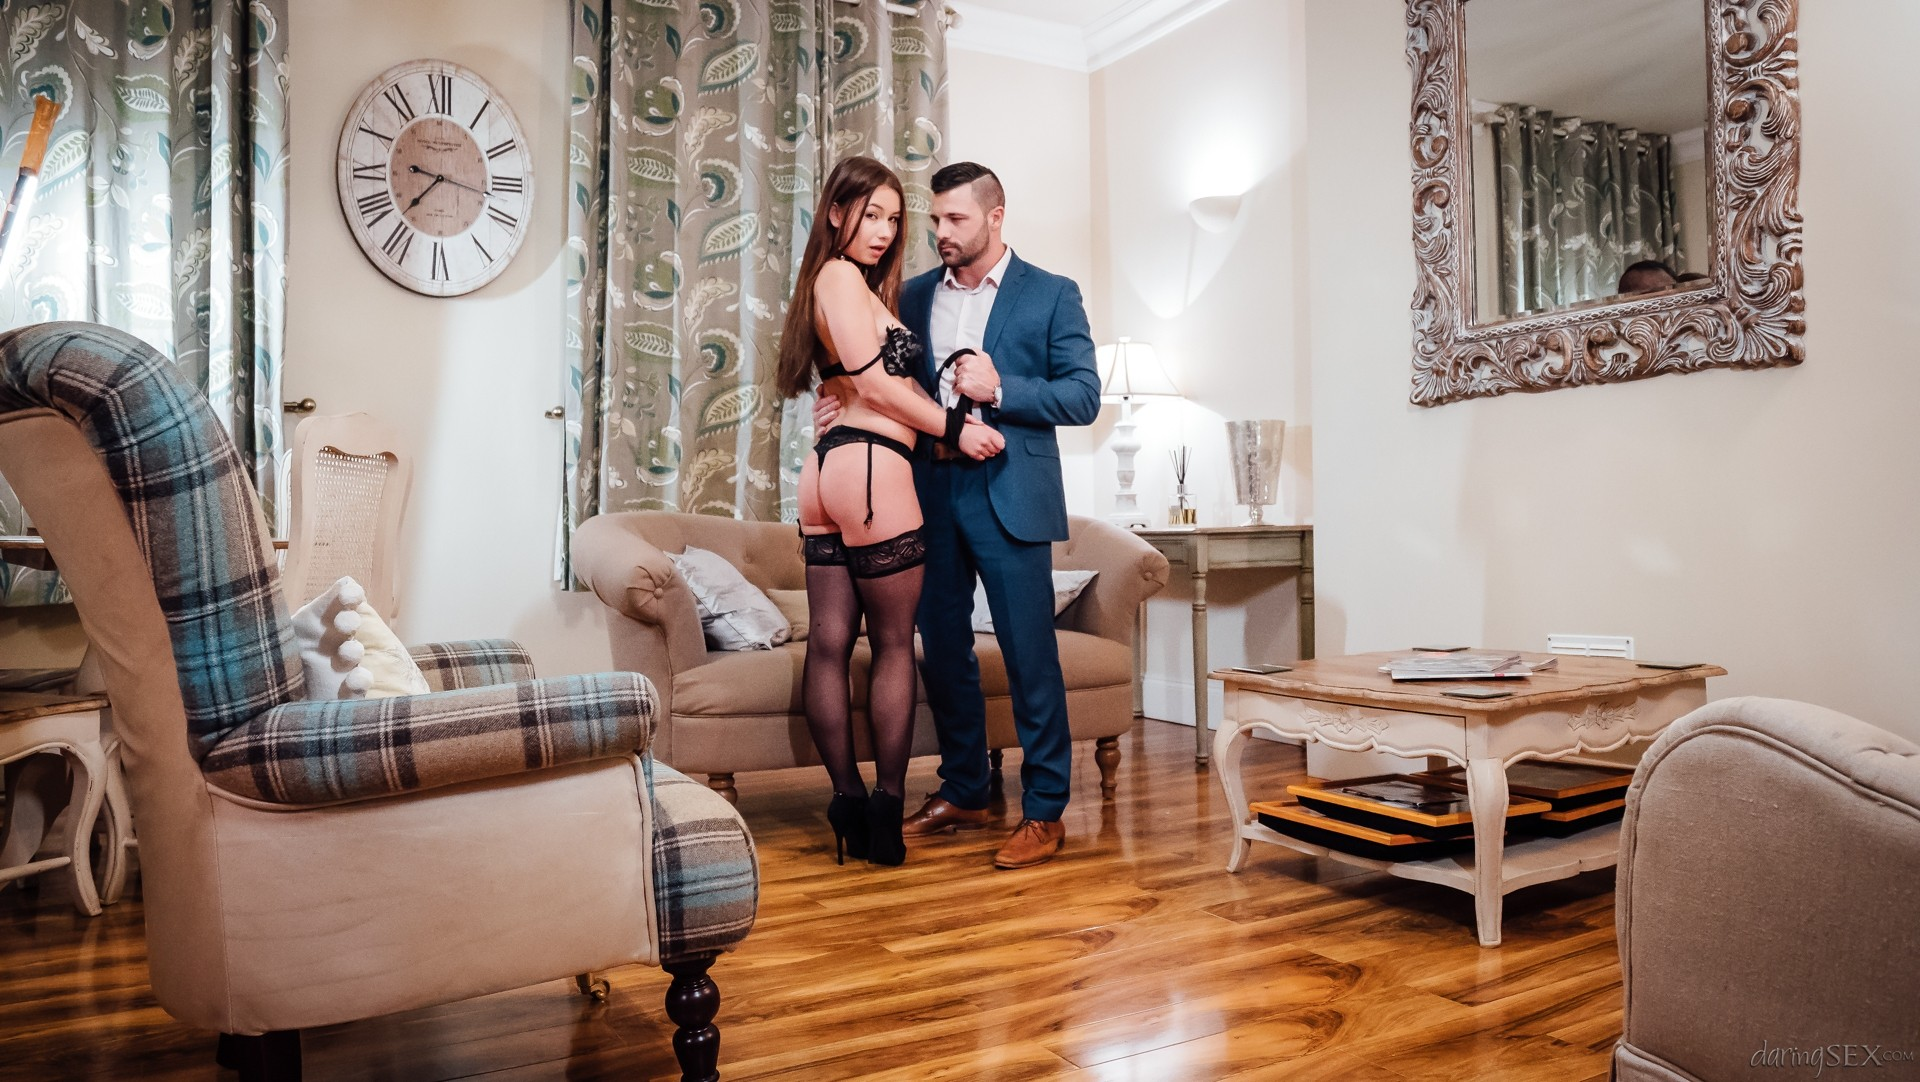 Taylor Sands - Дрочка - Порно галерея № 3545025